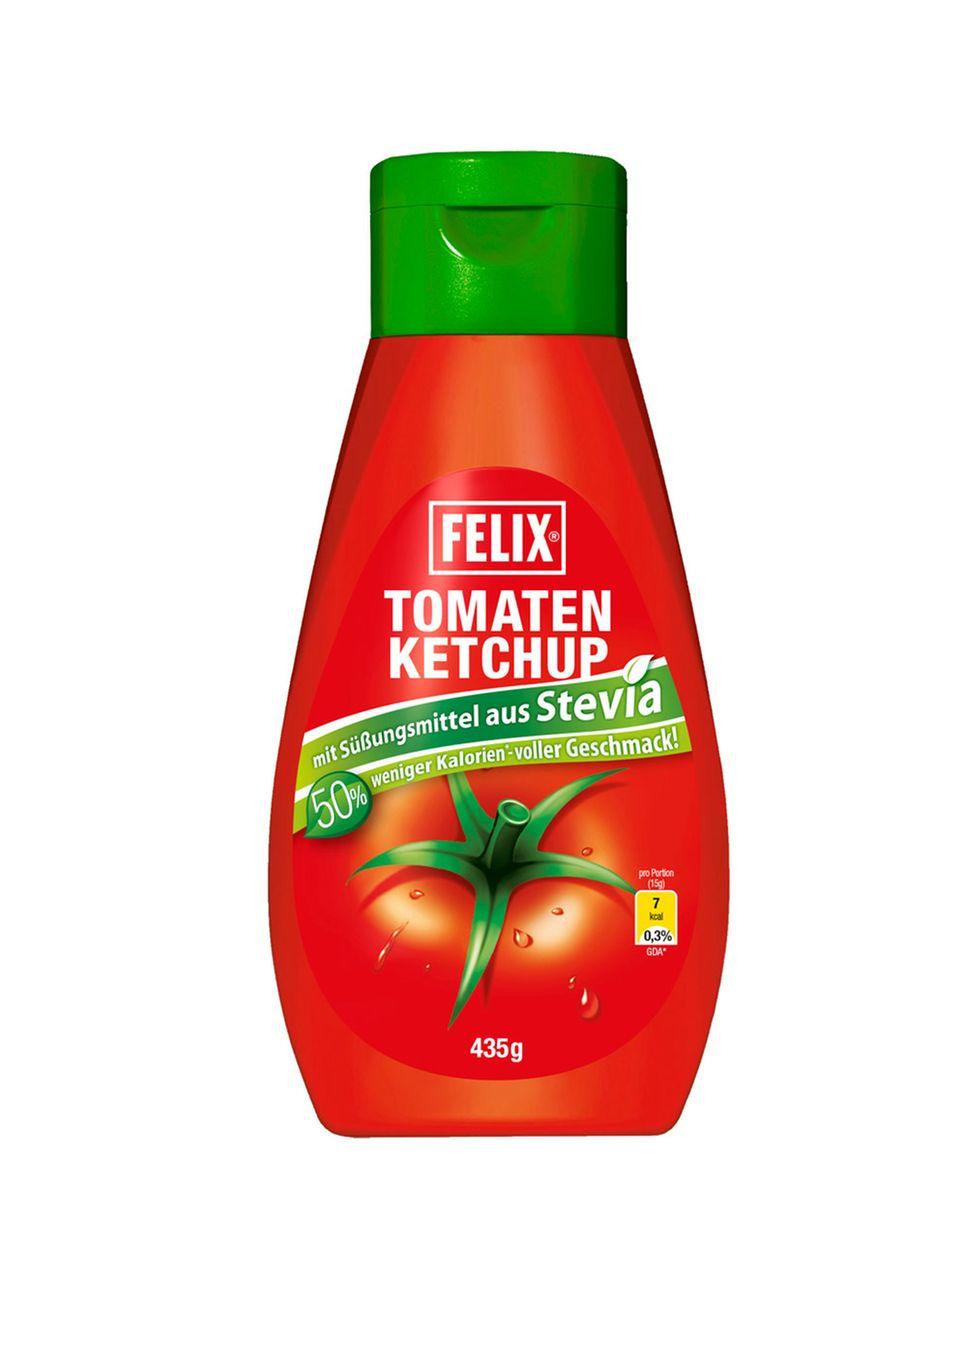 Stevia Ketchup von Felix